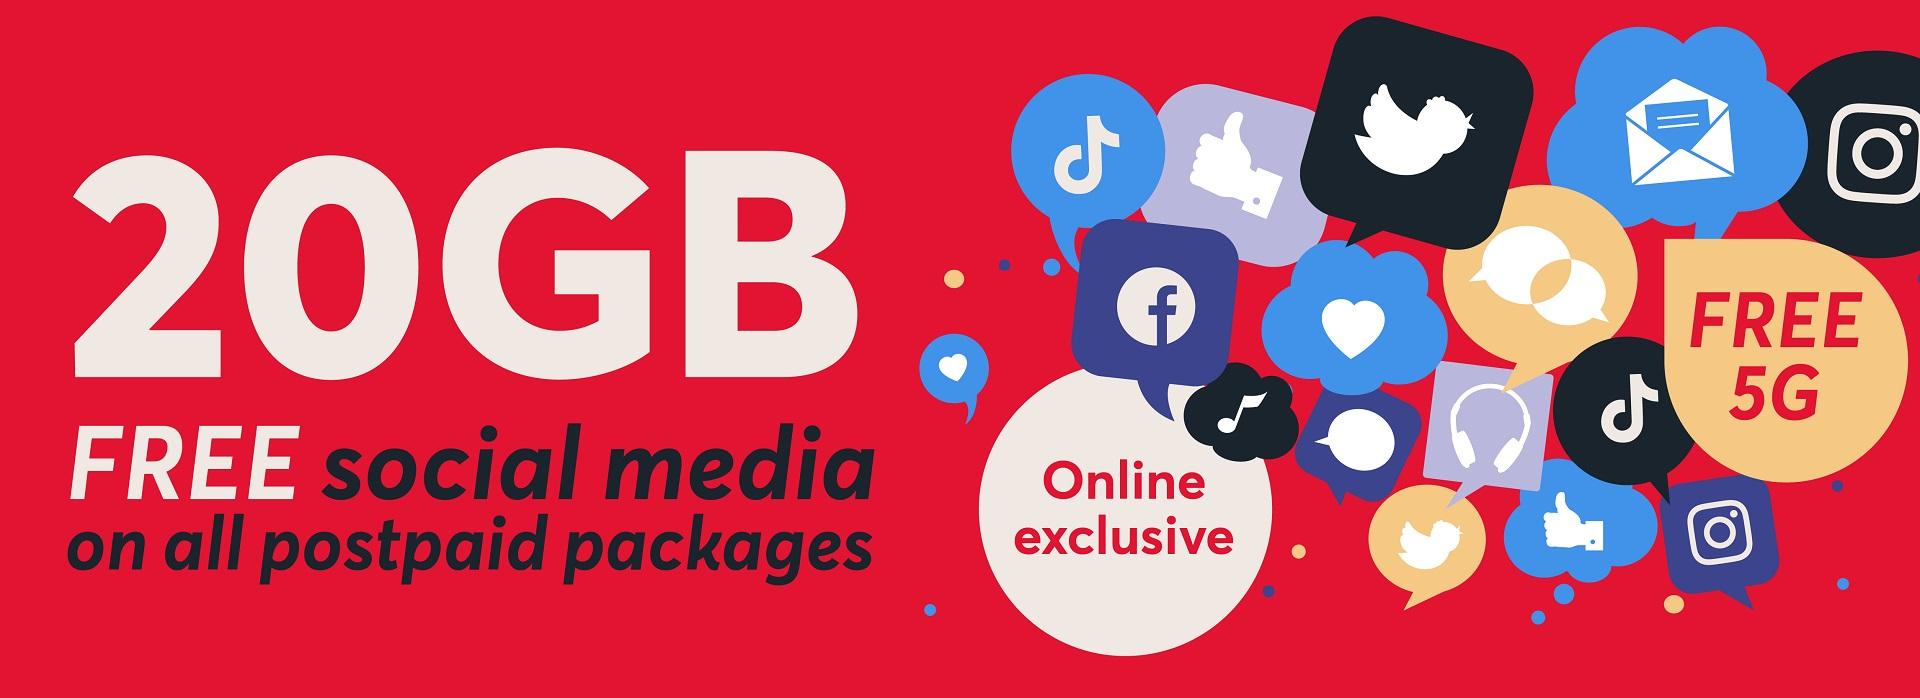 Online exclusive postpaid En P